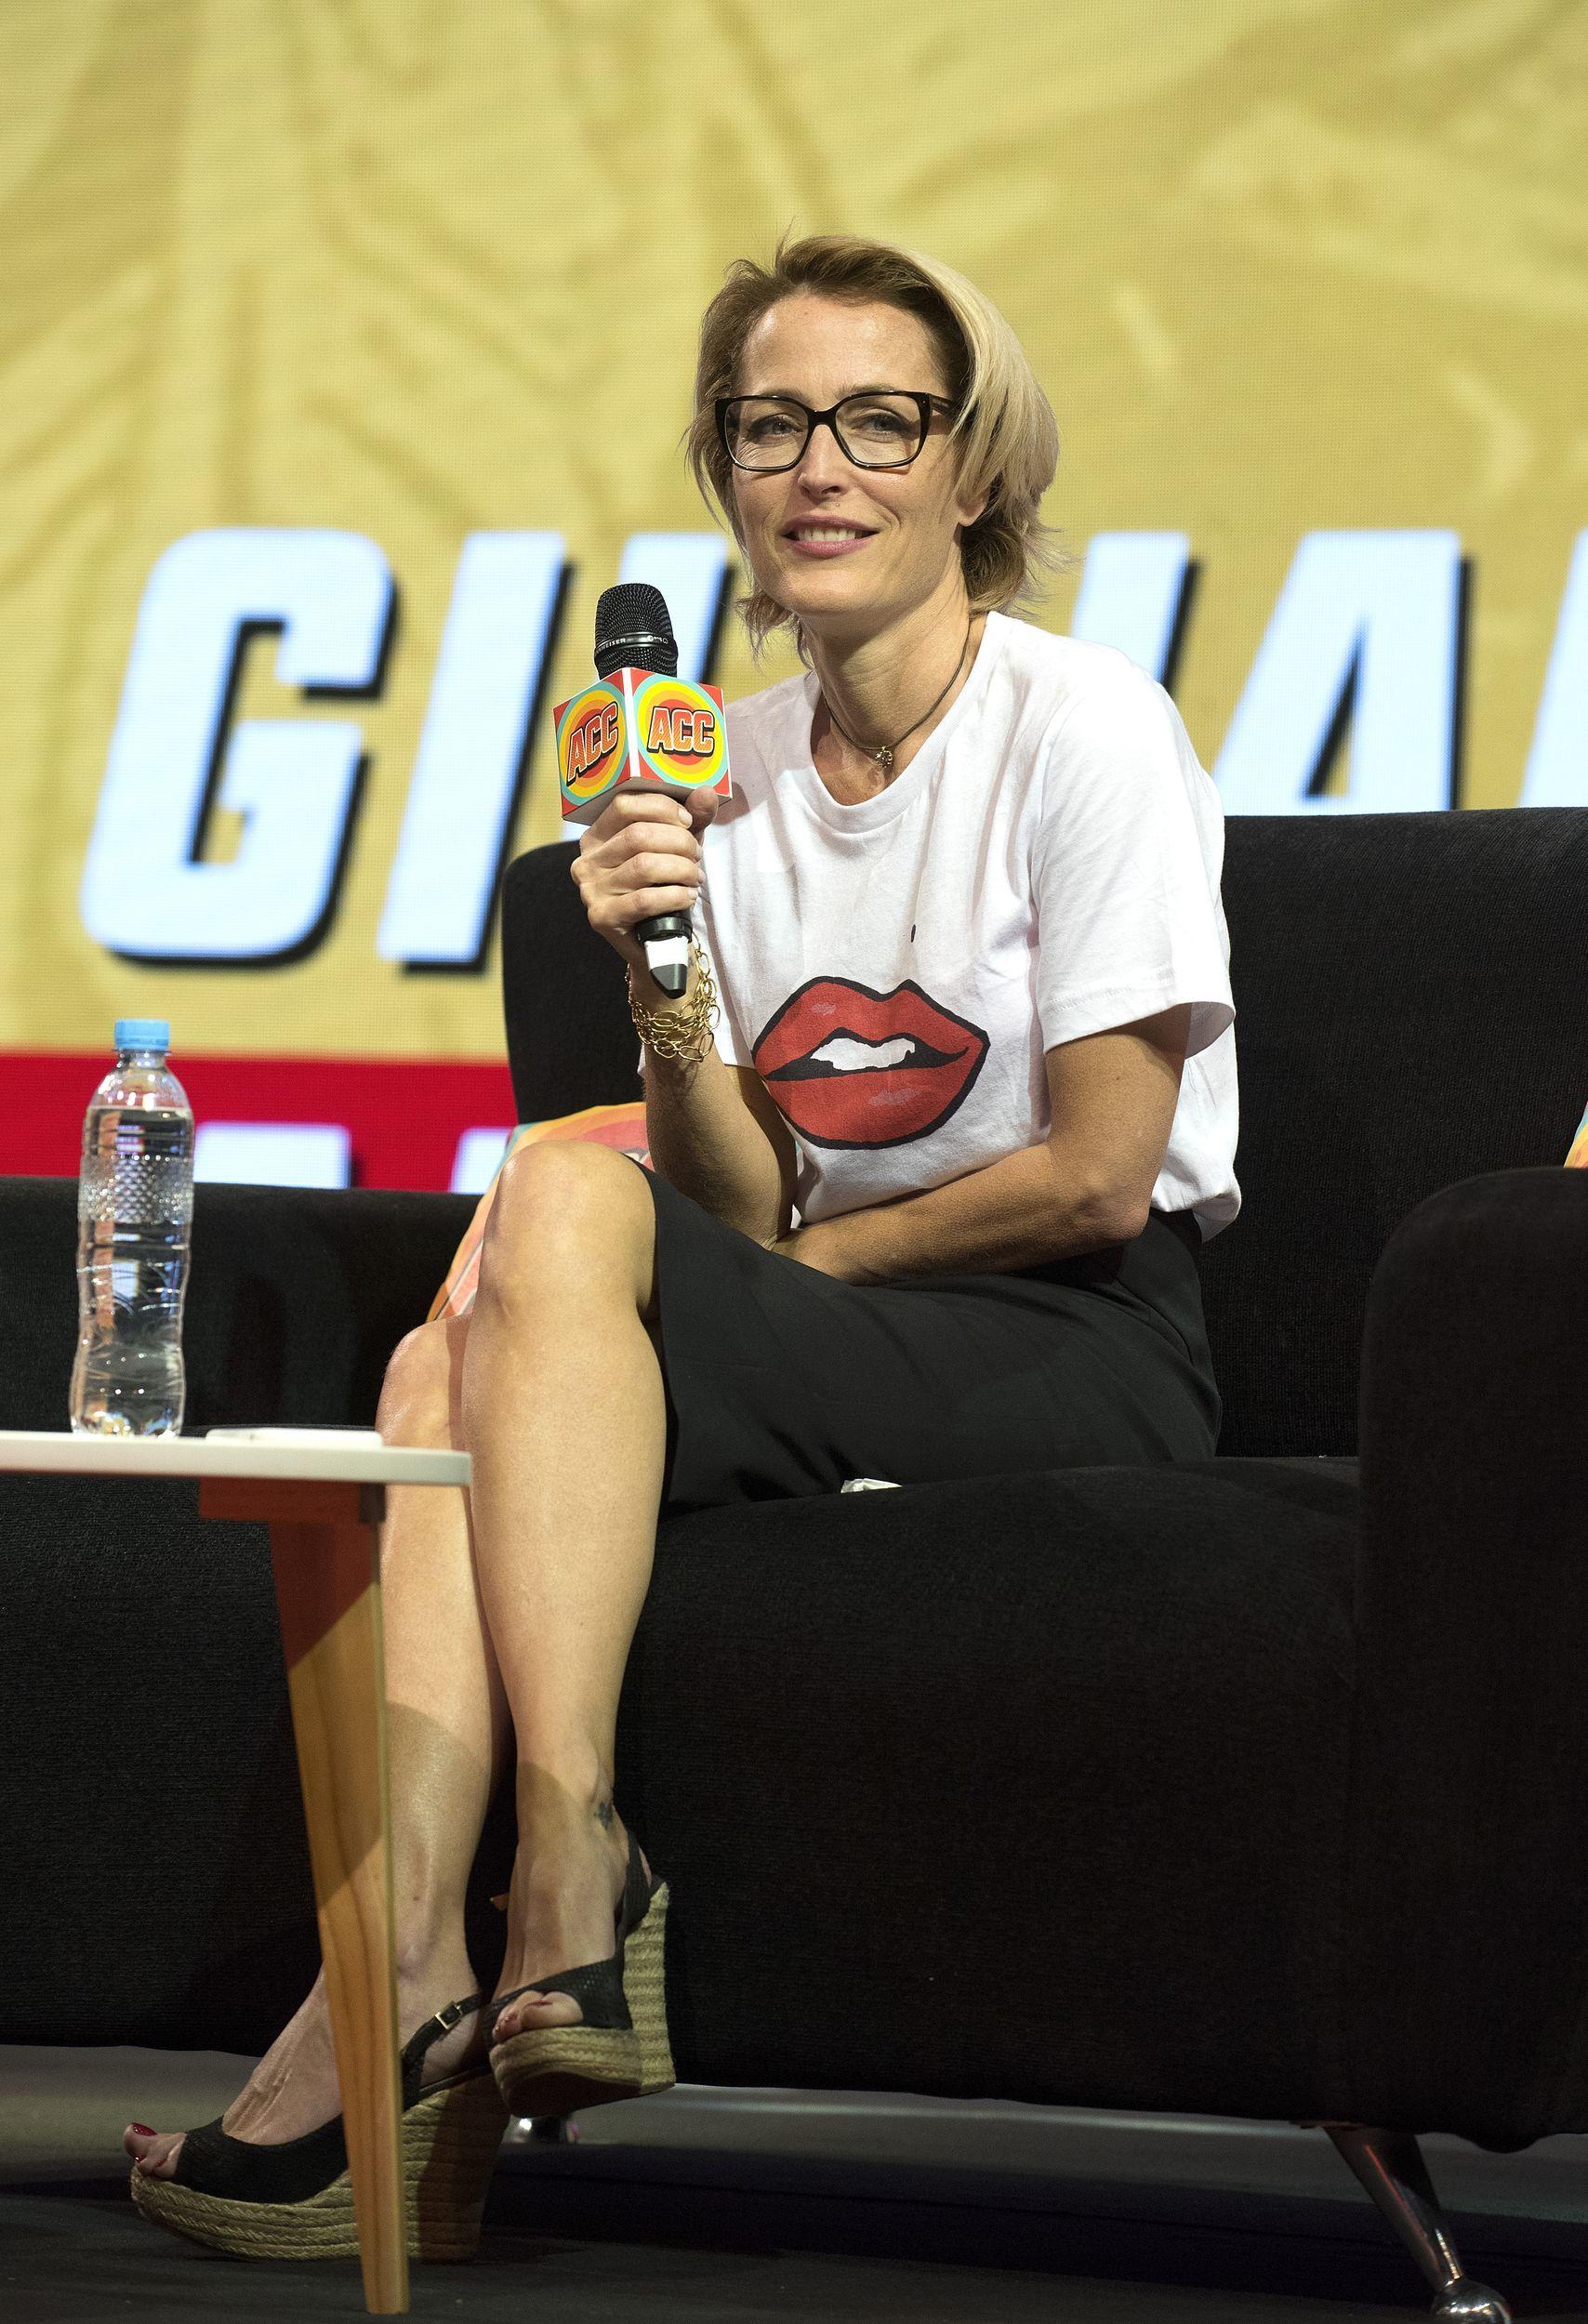 Gillian Anderson Wikifeet